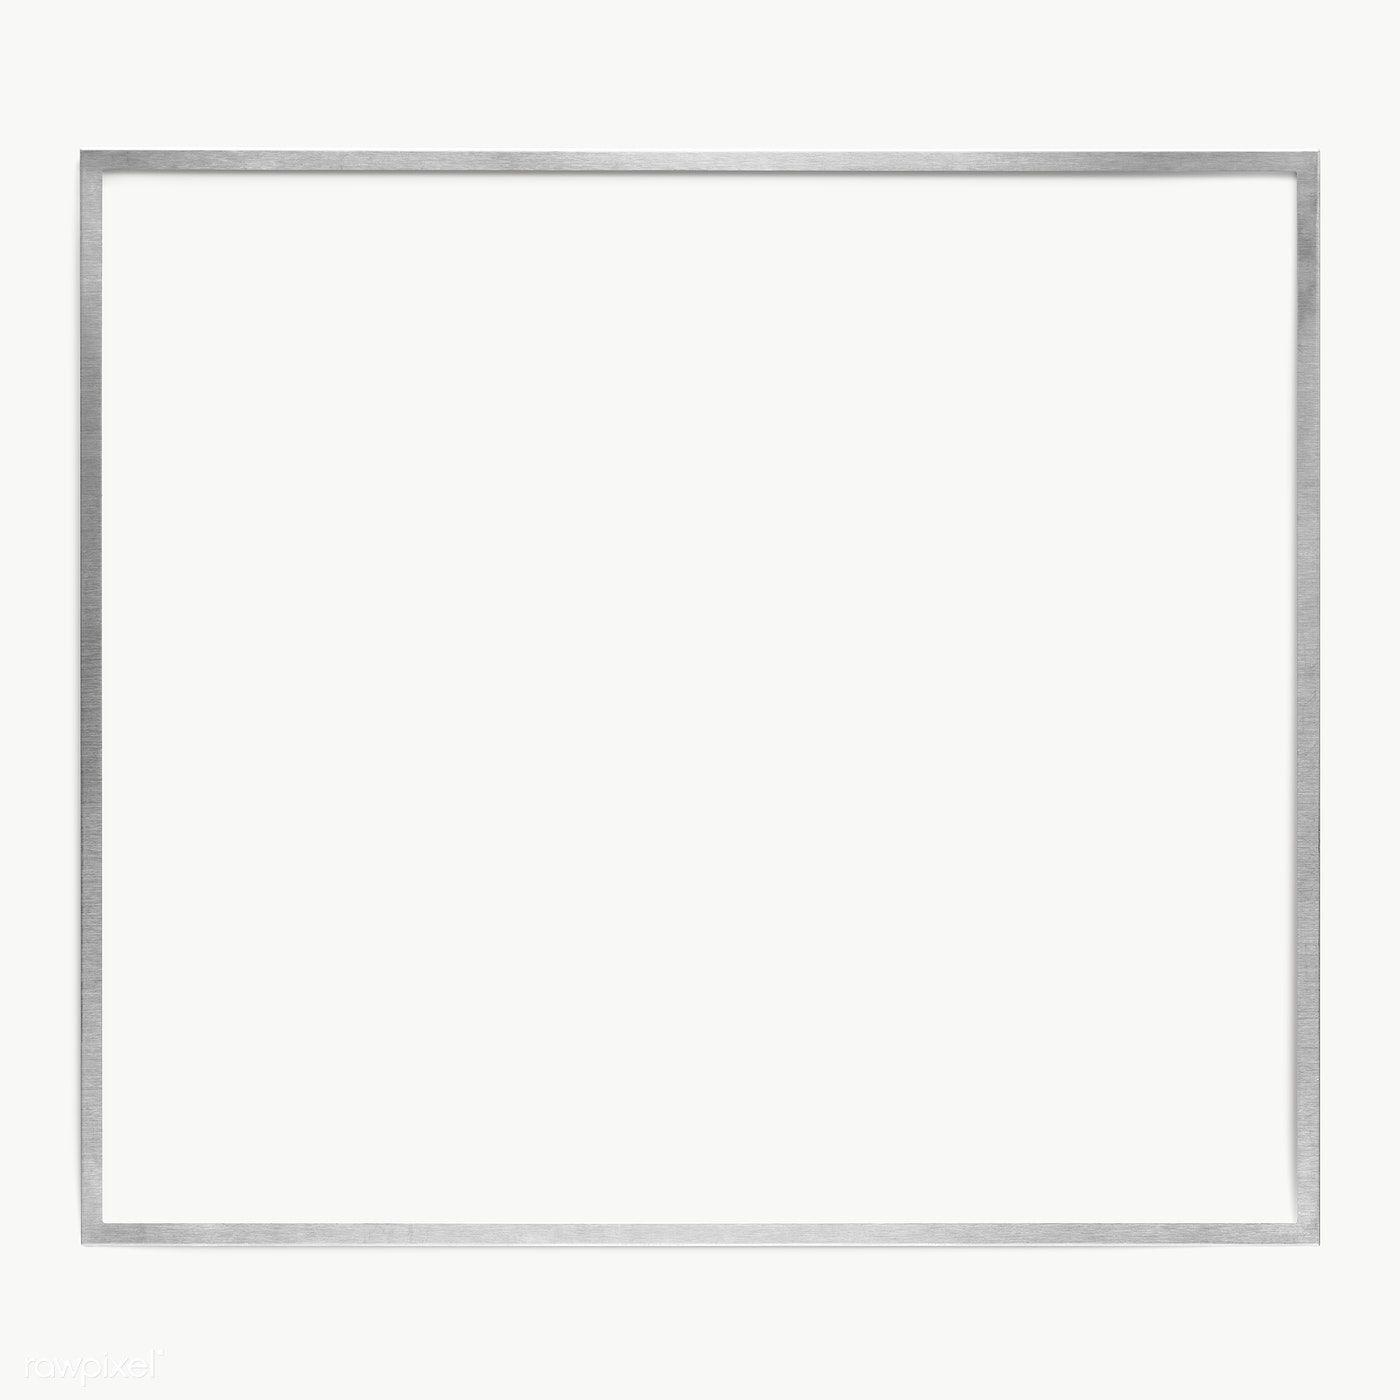 Silver Square Frame Design Element Free Image By Rawpixel Com Jira Frame Design Square Frames Frame